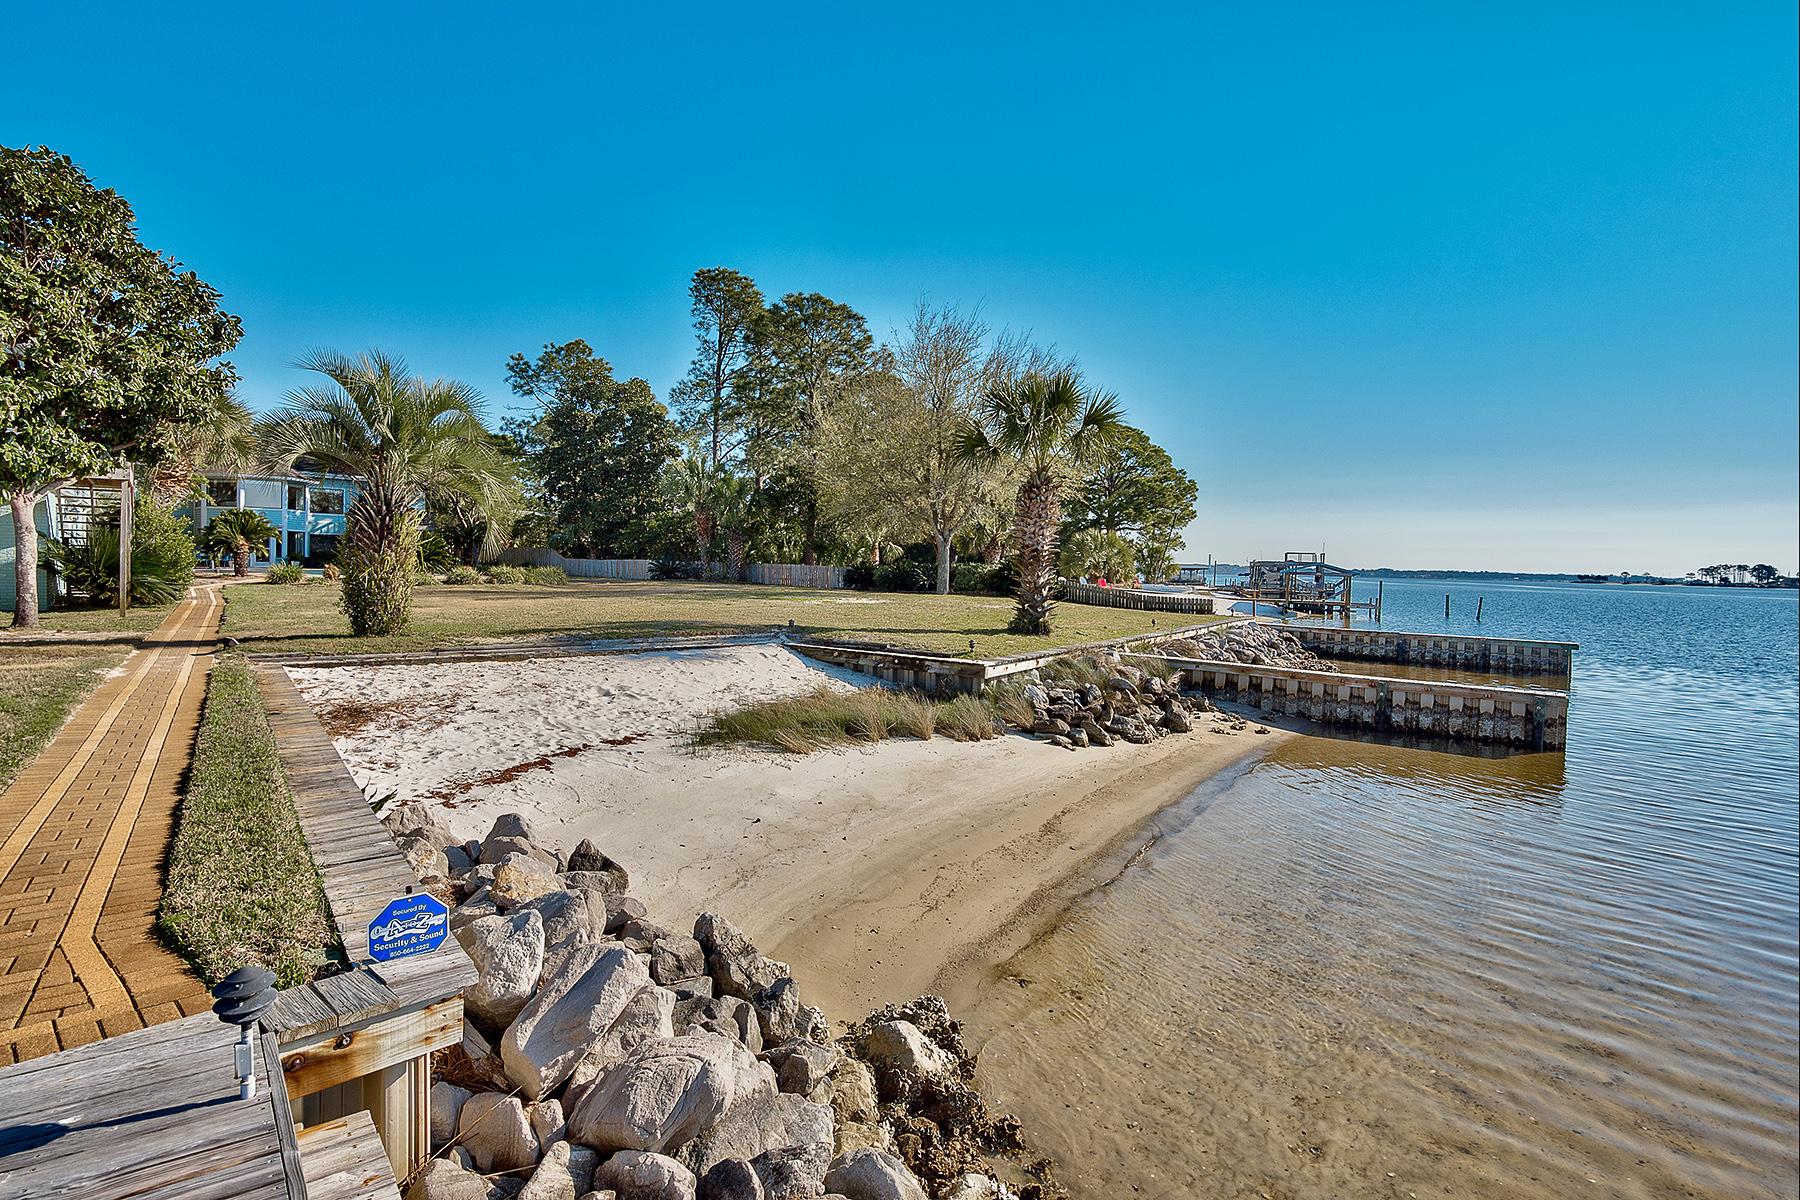 Casa Unifamiliar por un Venta en ULTIMATE WATERFRONT PARADISE HOME WITH 2 STORY DECK 225 NE Beachview Drive Fort Walton Beach, Florida 32547 Estados Unidos